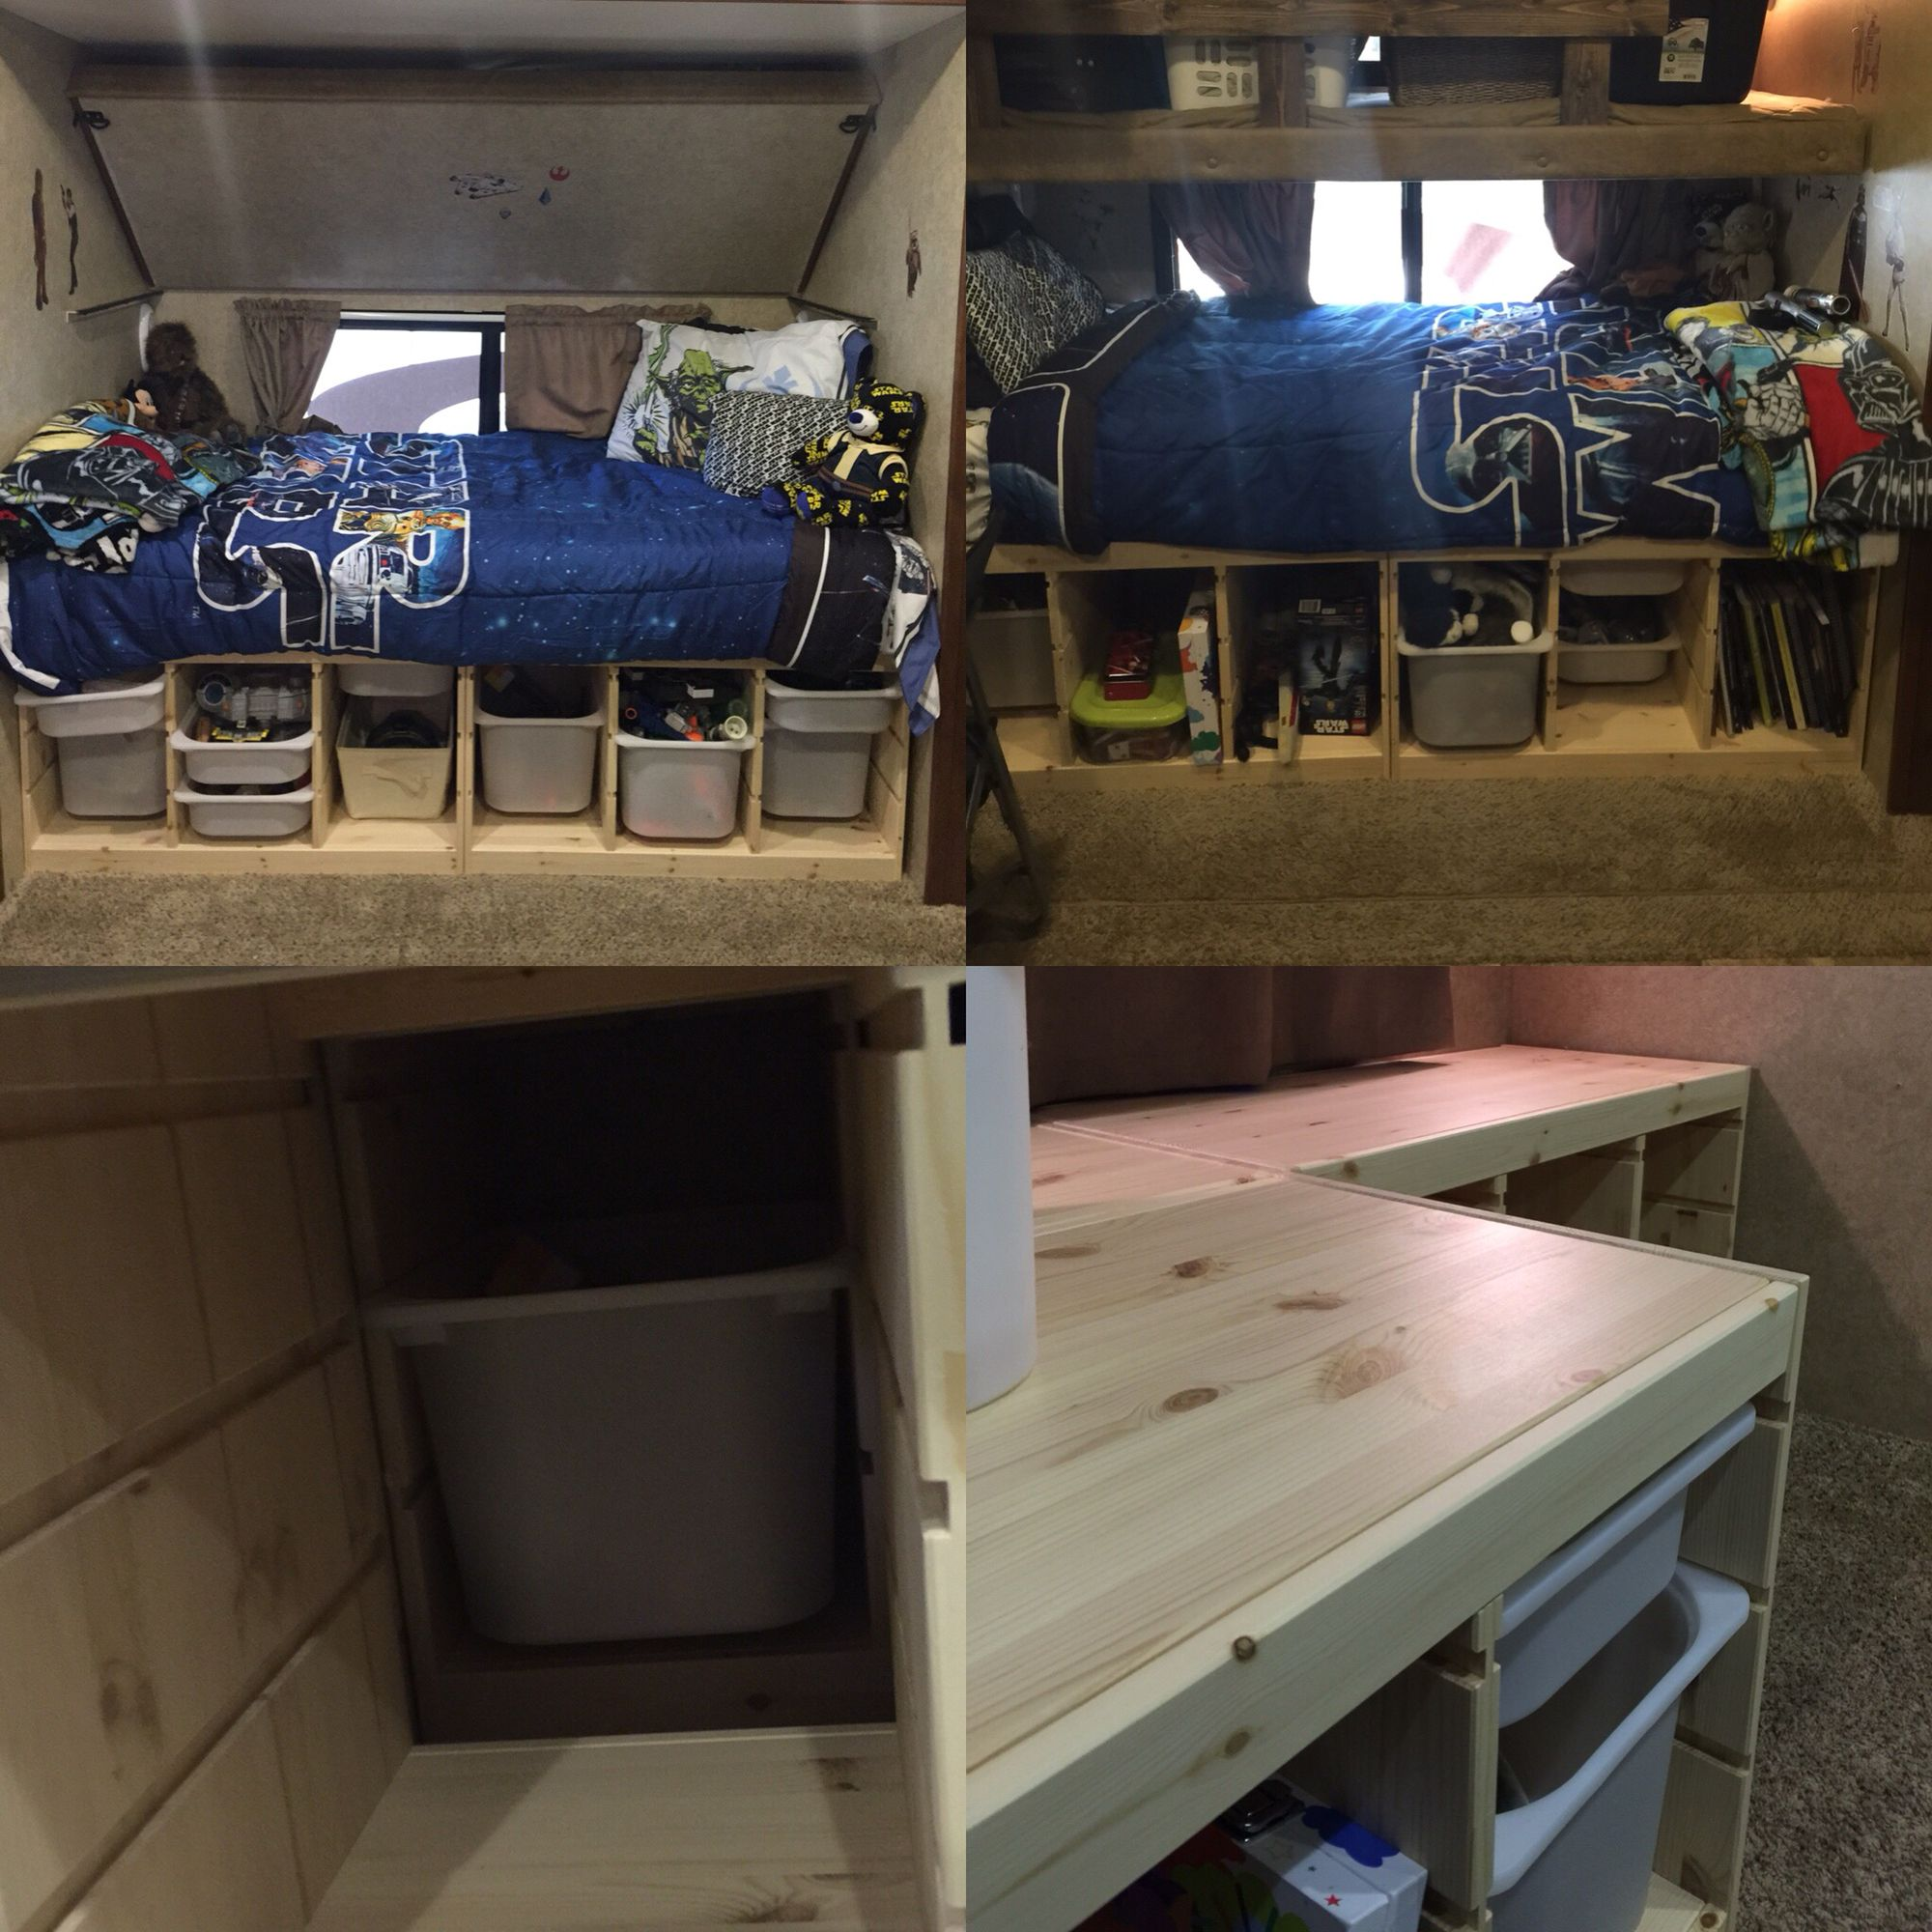 Rvs Wandplank Ikea.Rv Bunk Room Remodel We Didn T Like The Boys Sleeping In Tiny Hard